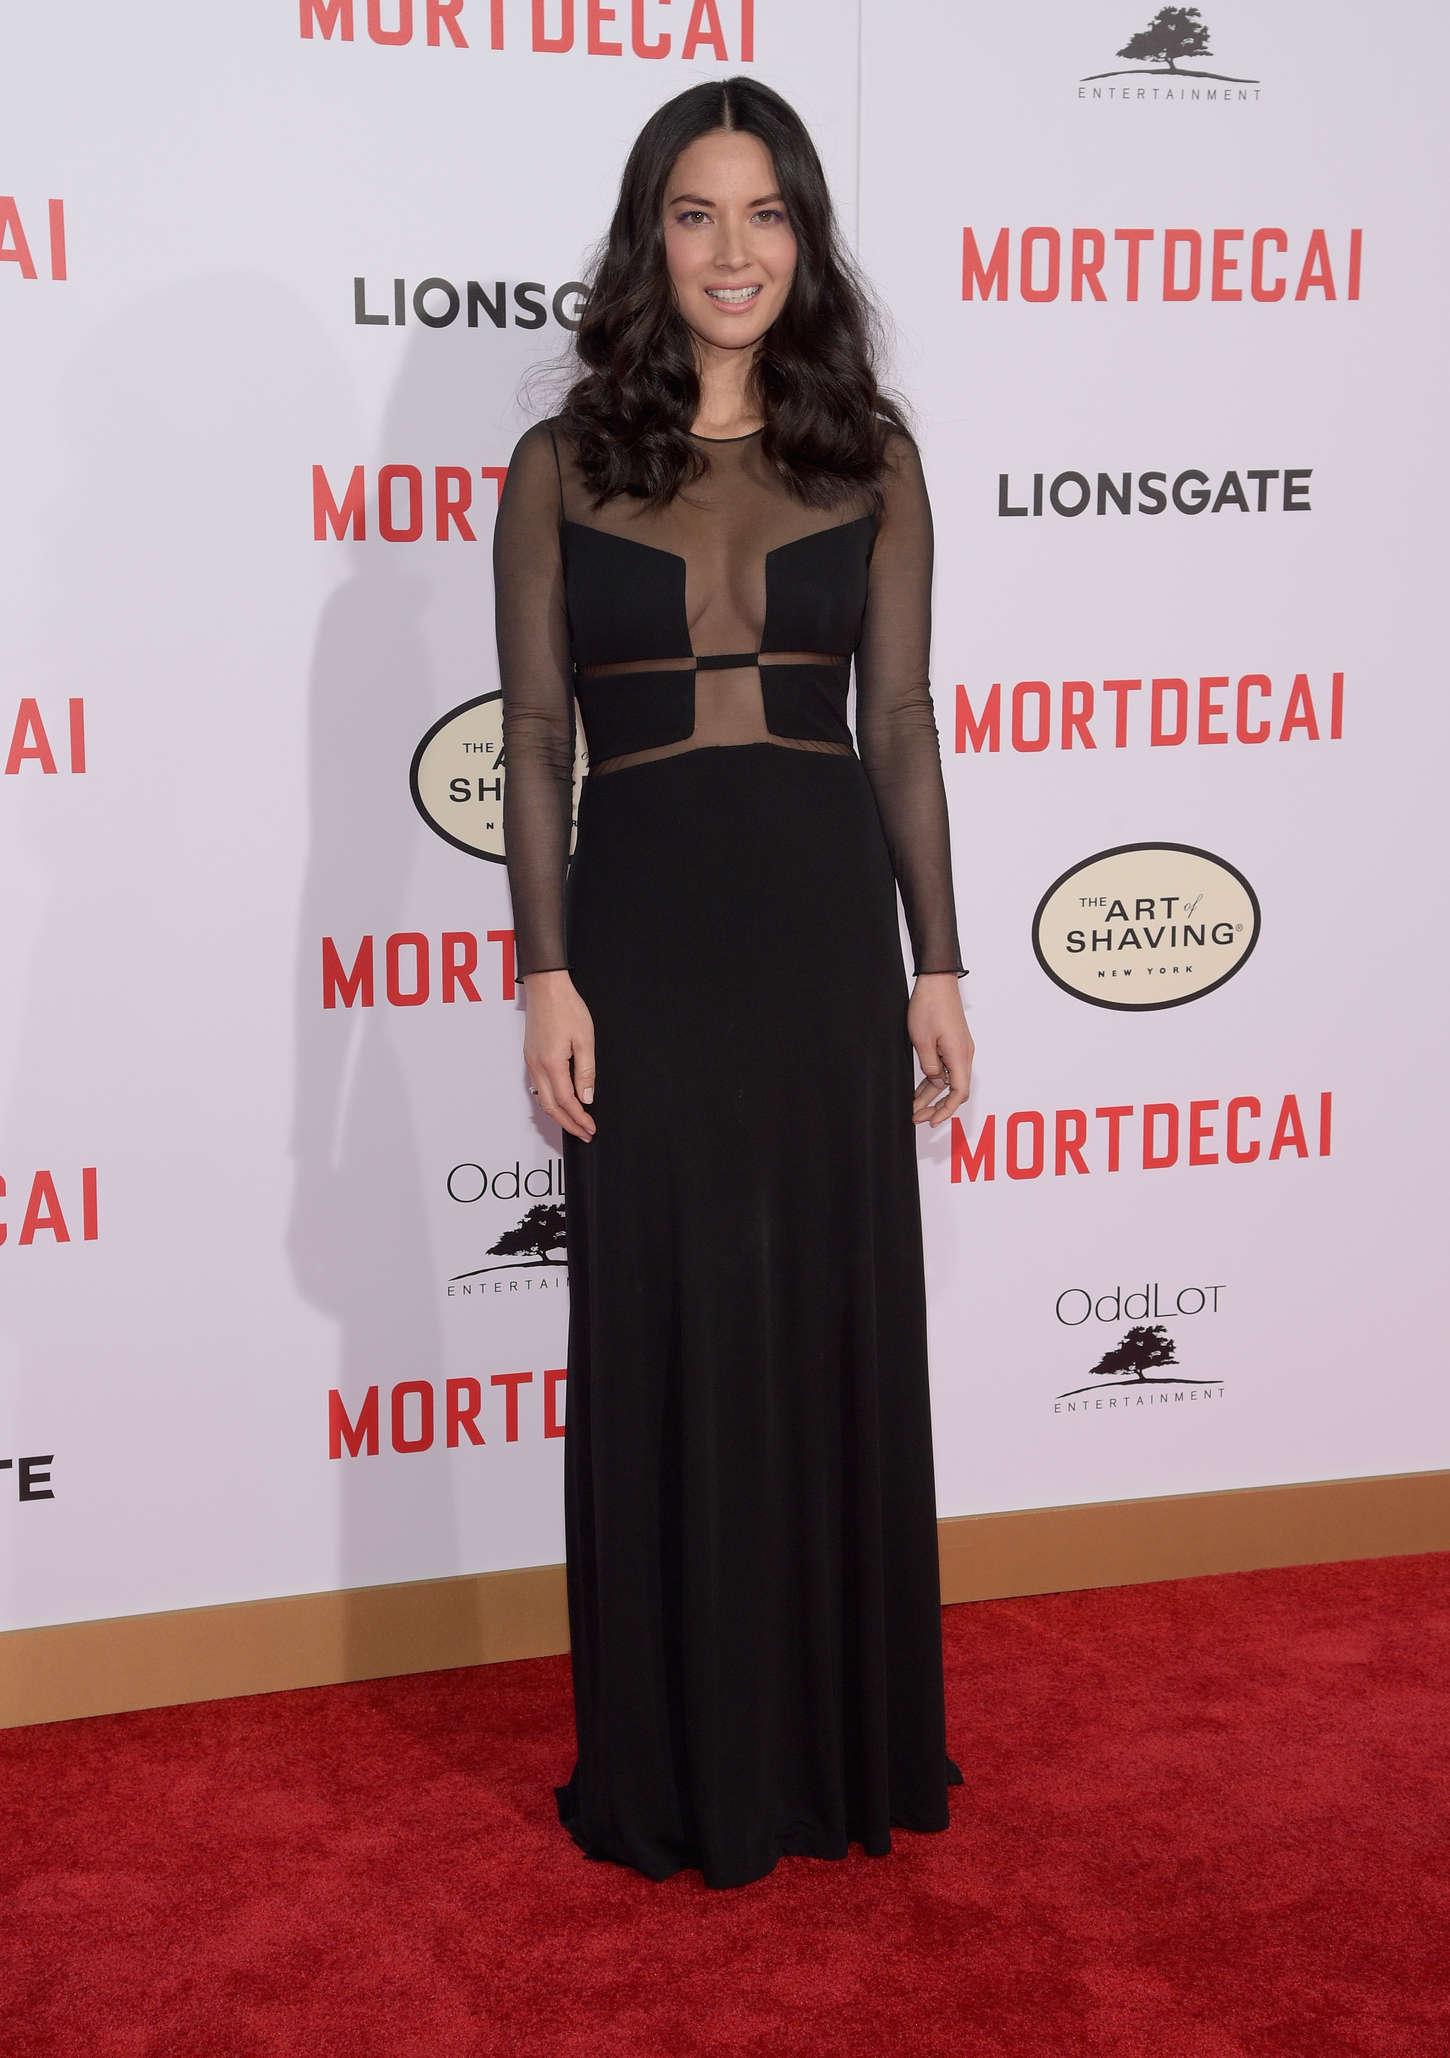 Olivia Munn 2015 : Olivia Munn: Mortdecai LA Premiere -08